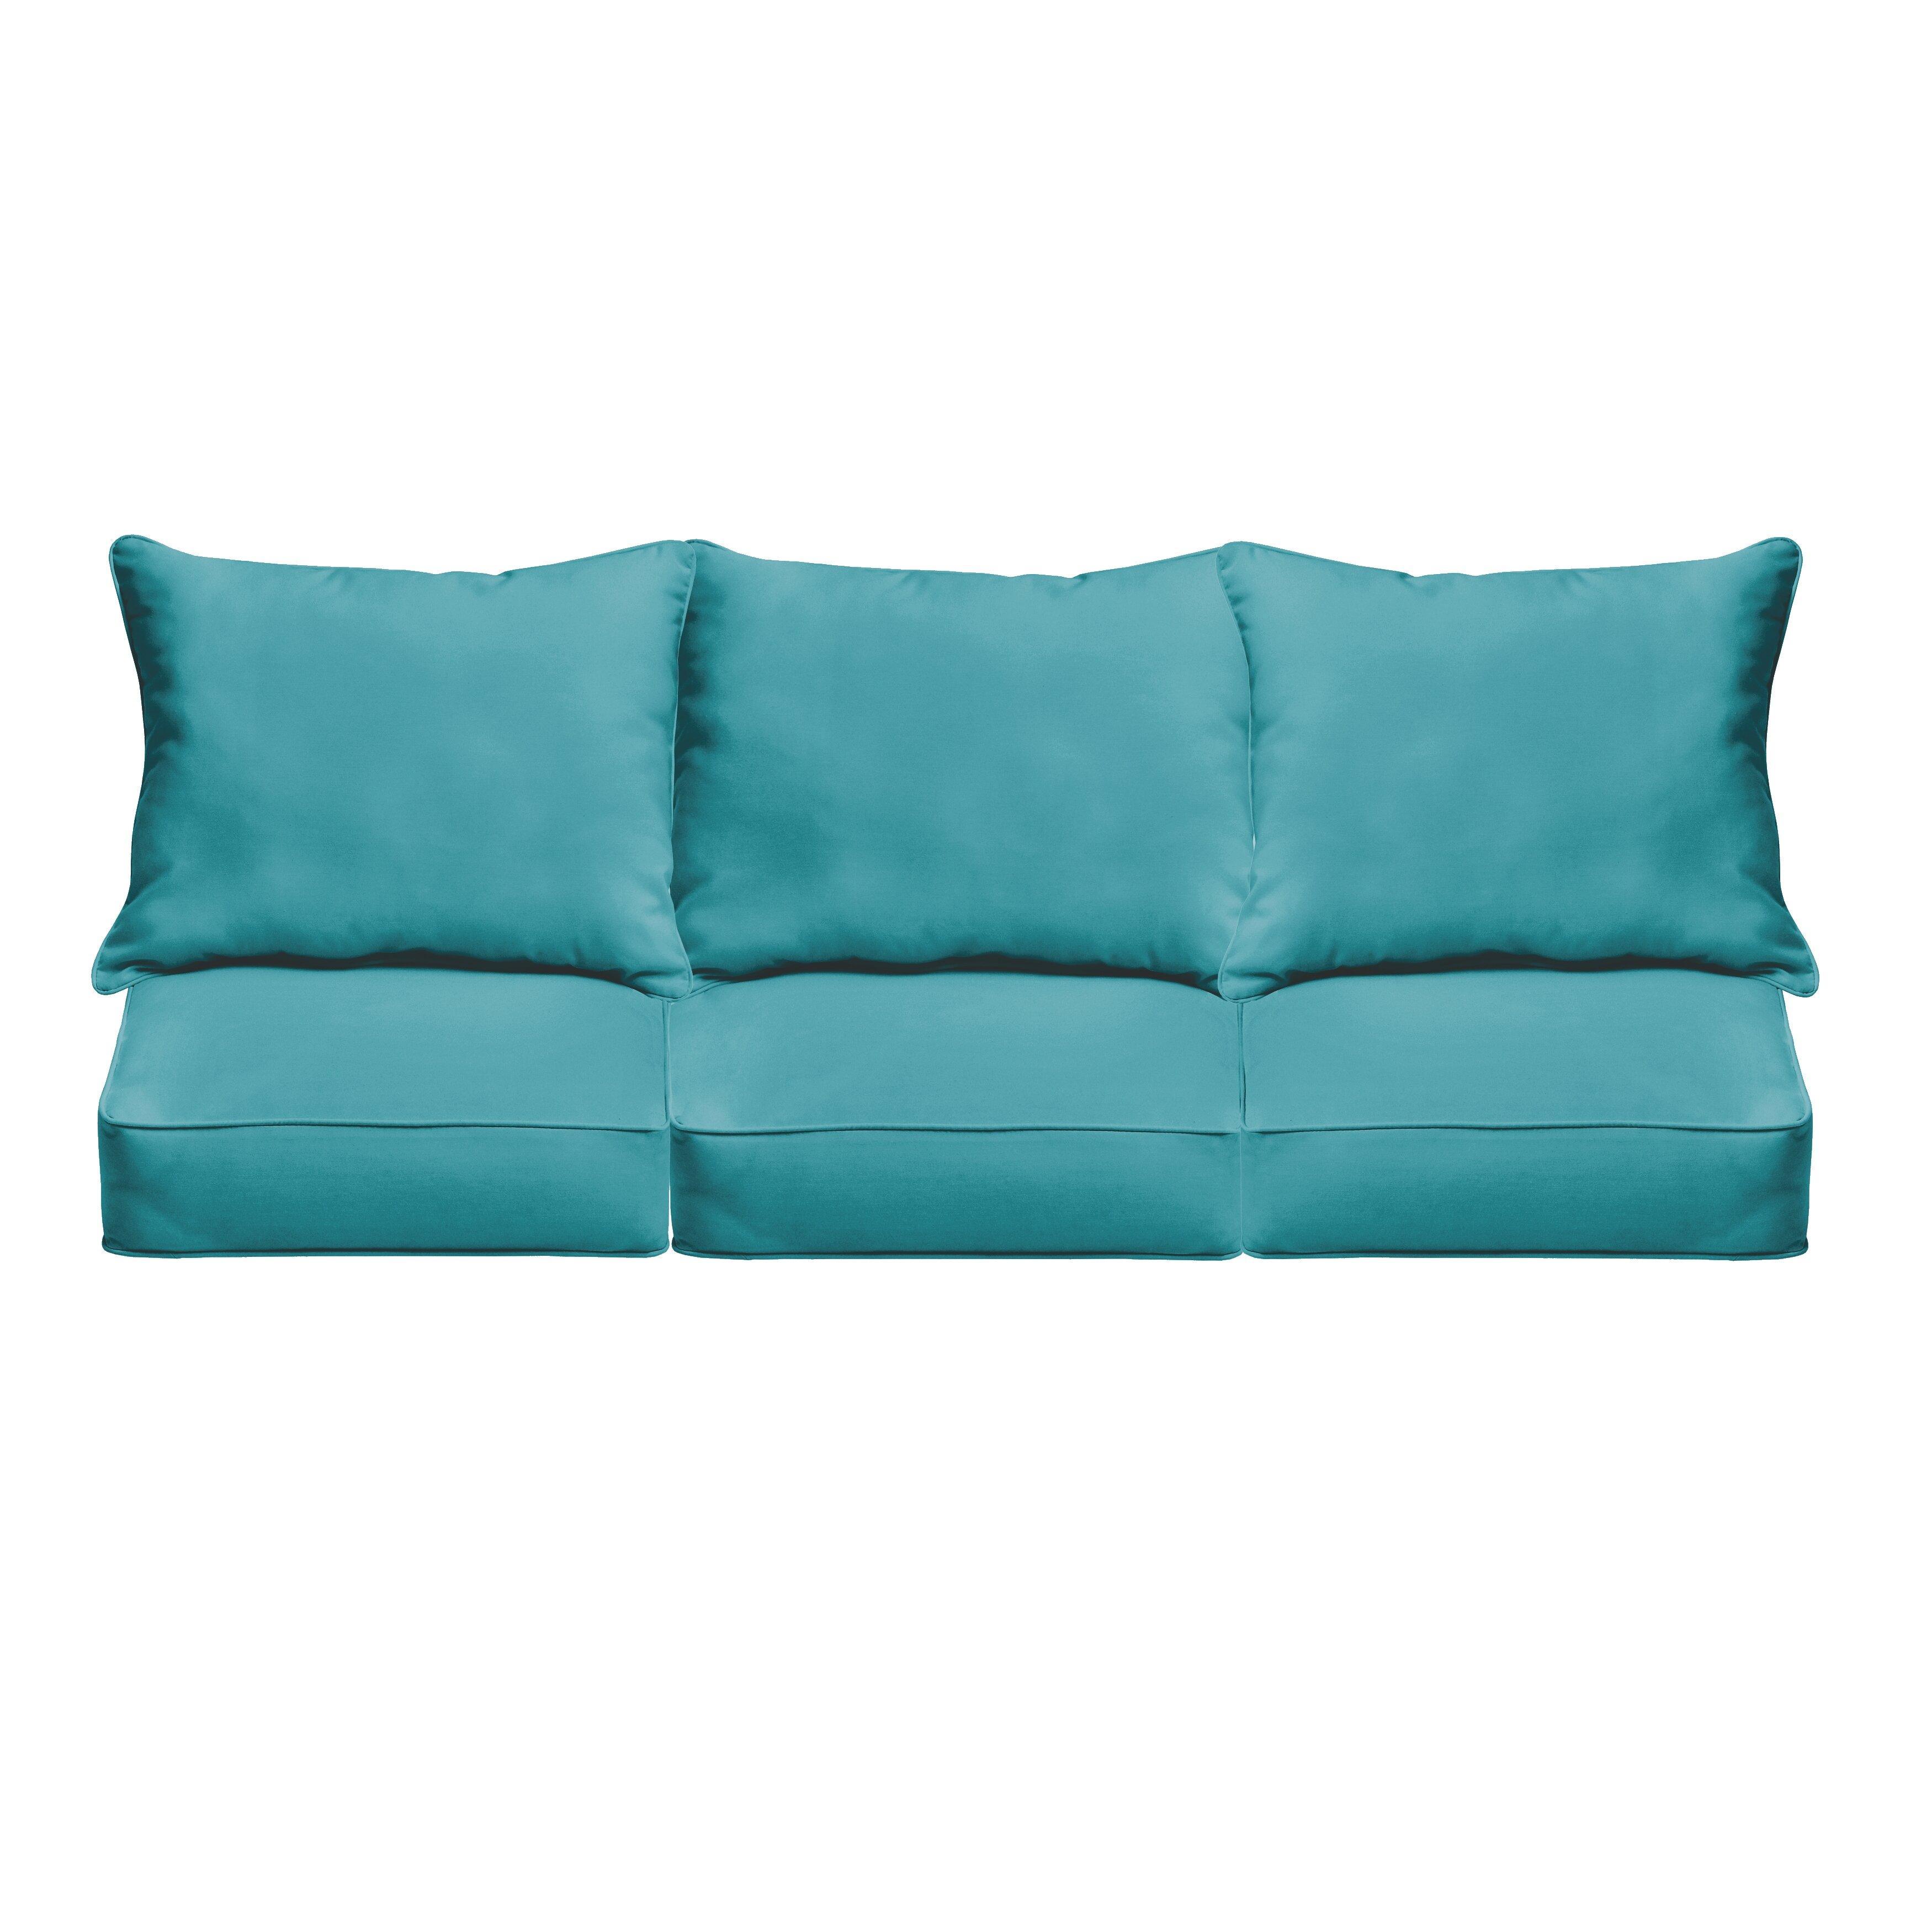 Beau Brayden Studio Indoor/Outdoor Sofa Cushions U0026 Reviews | Wayfair